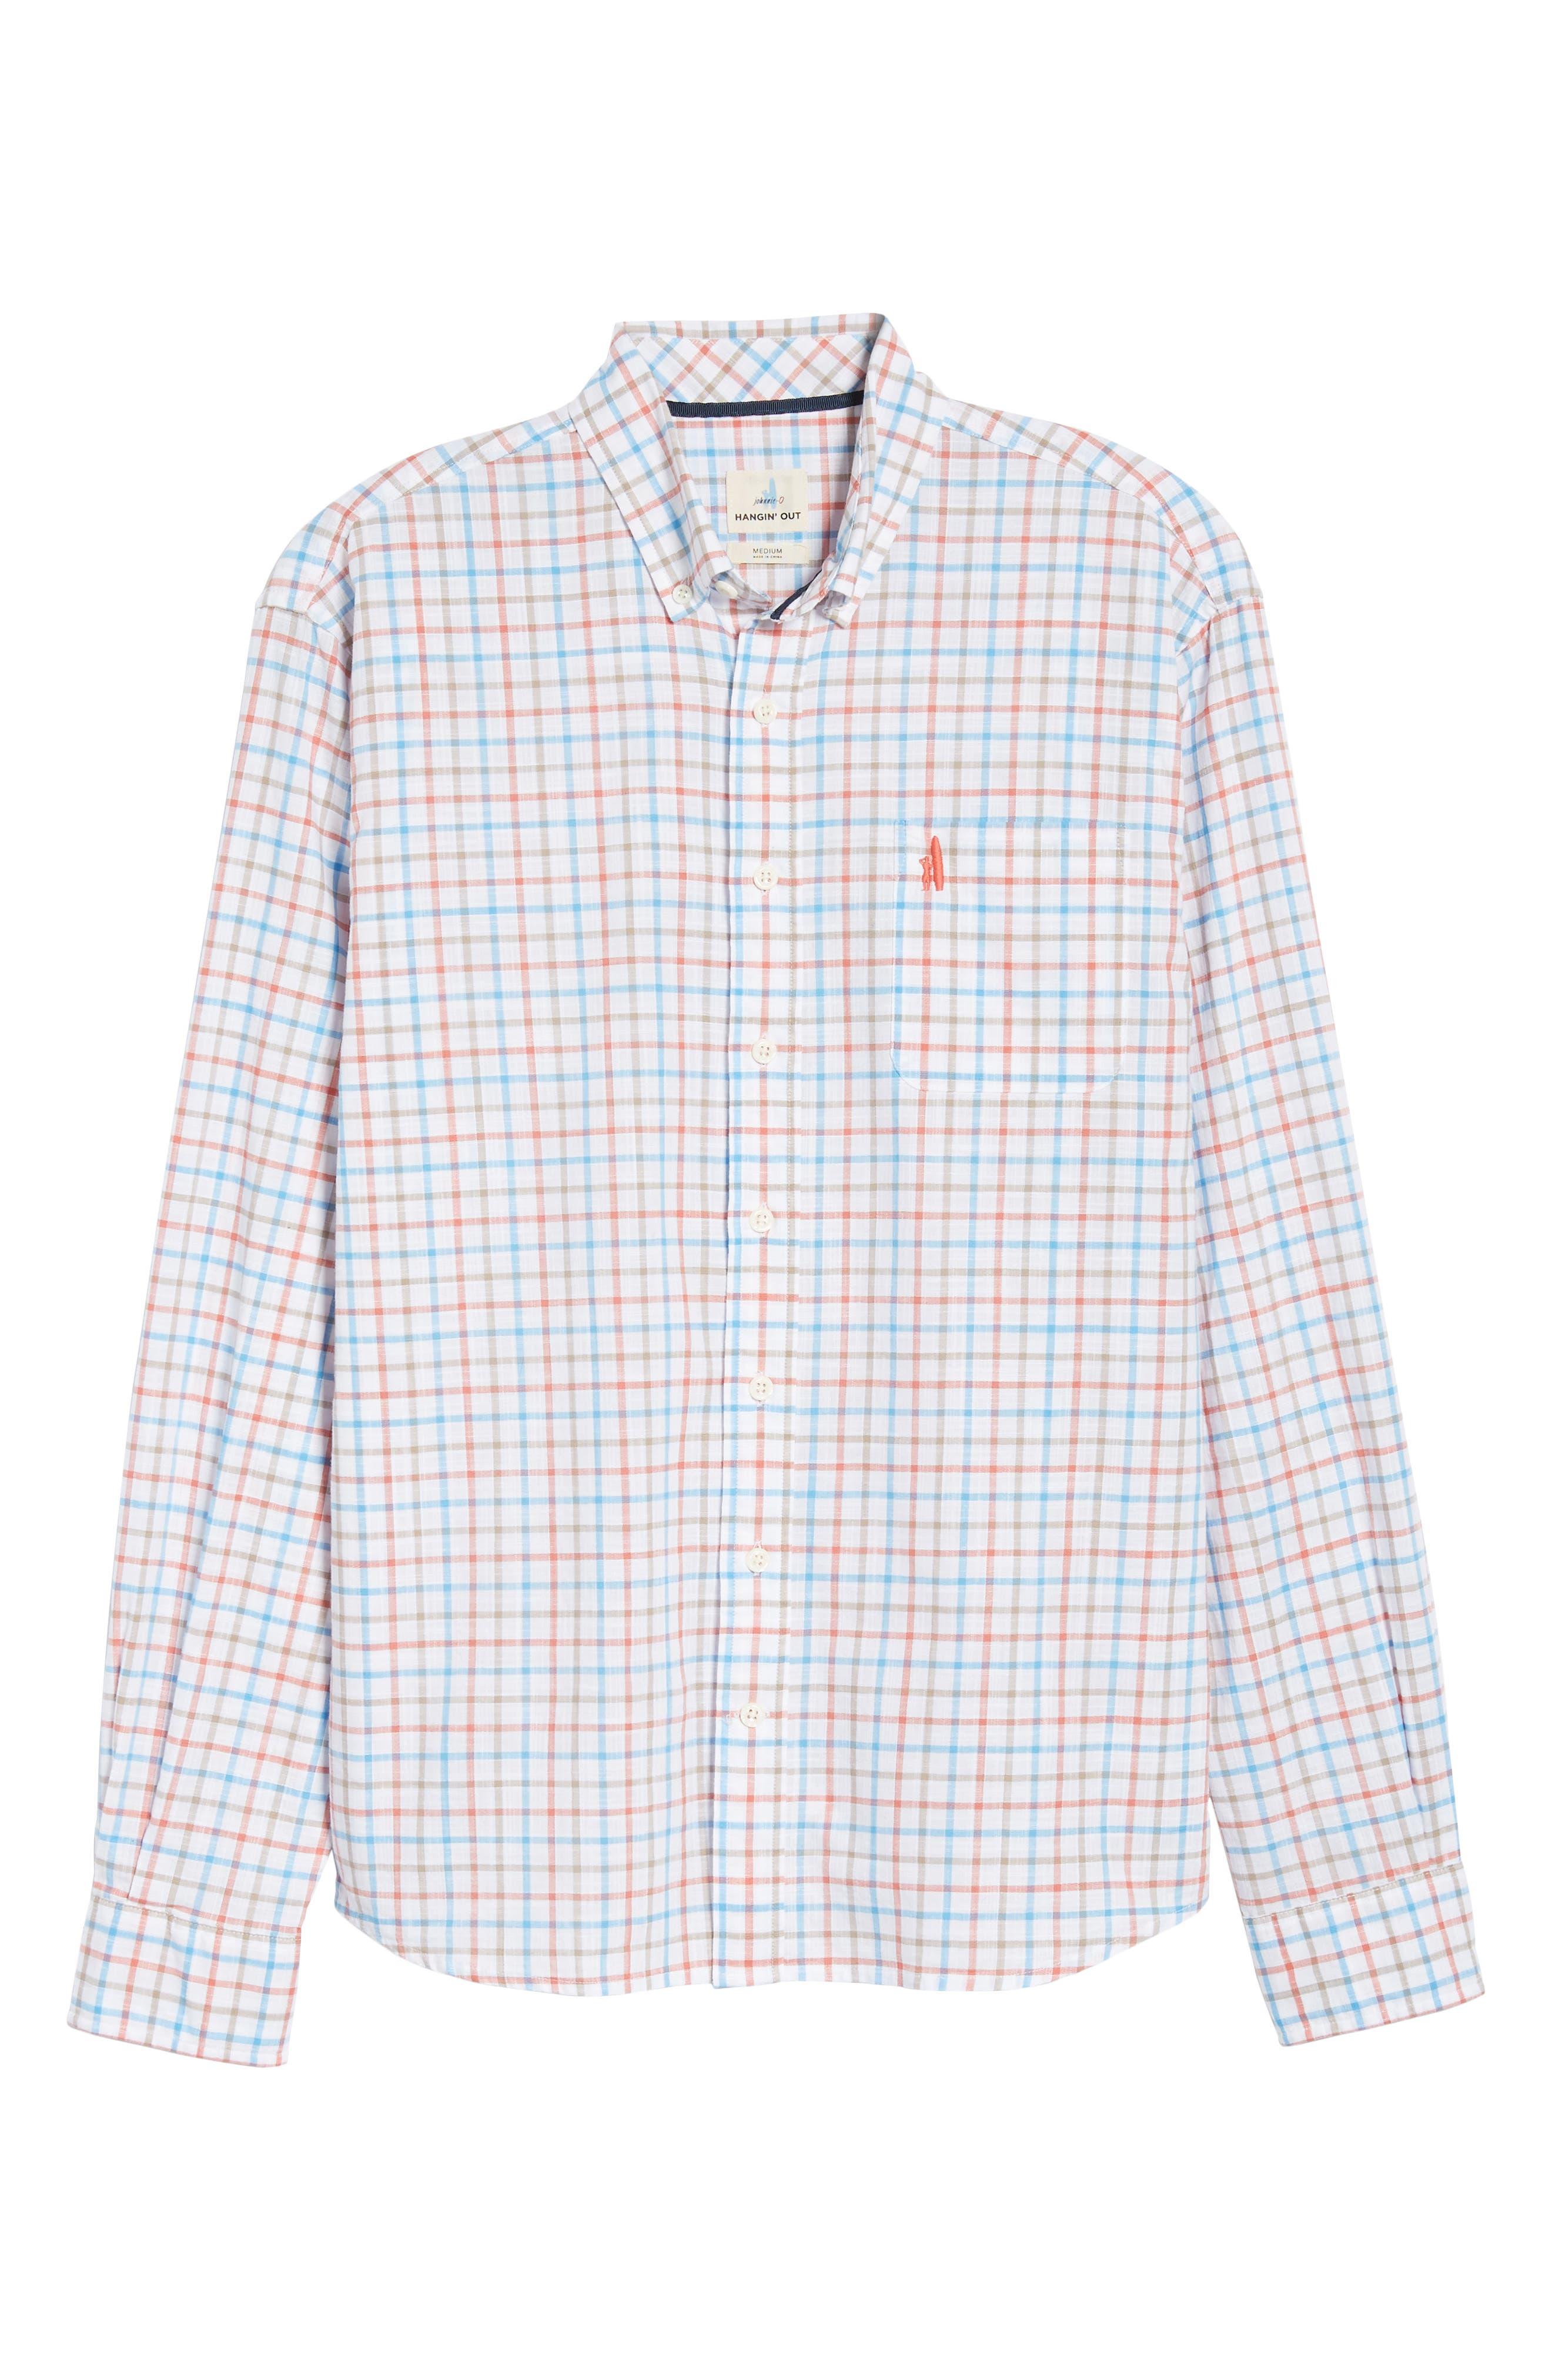 Grayson Regular Fit Sport Shirt,                             Alternate thumbnail 6, color,                             667